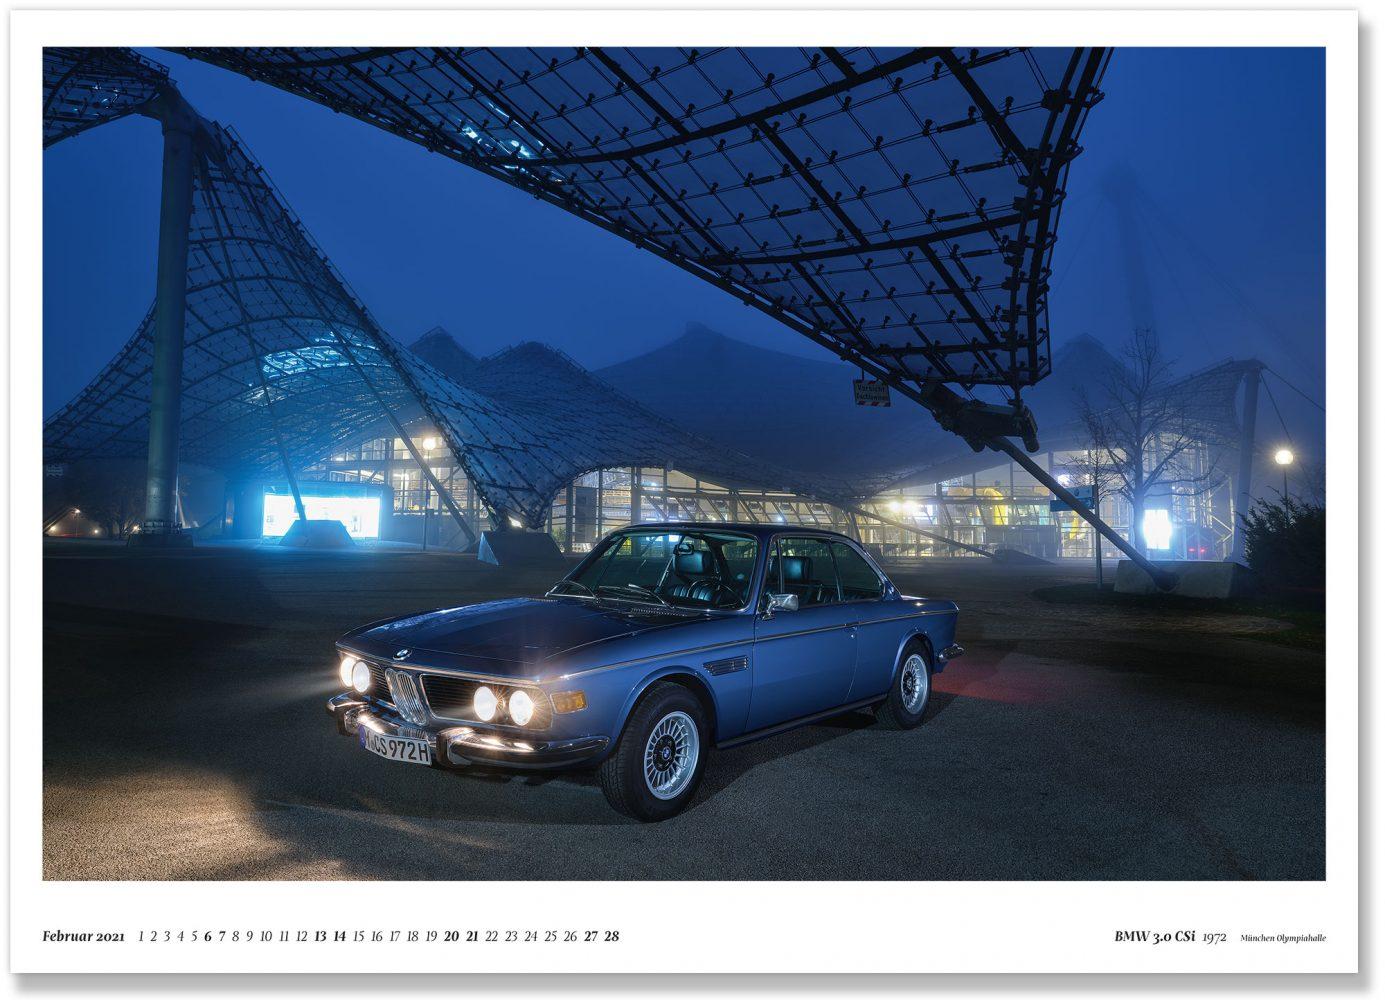 BMW 3.0 CSi 1972 München Olympiahalle